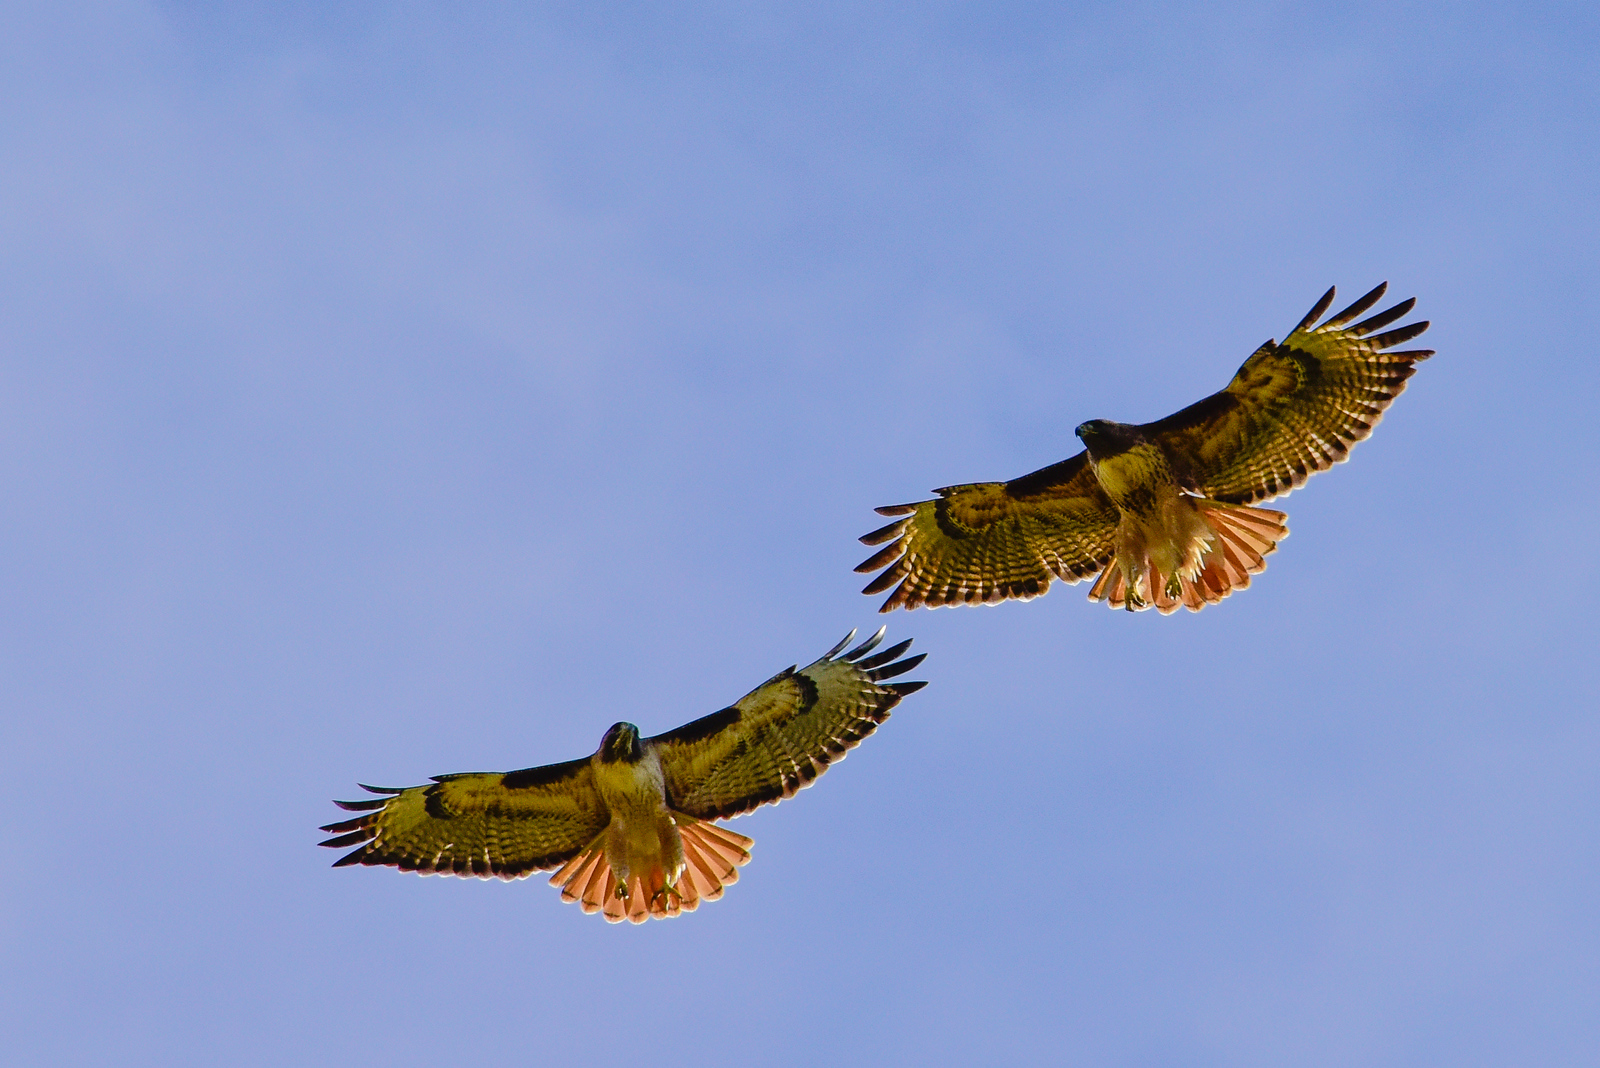 Red-tailed hawk in flight.  3666 Bumann road, Olivenhain, California.